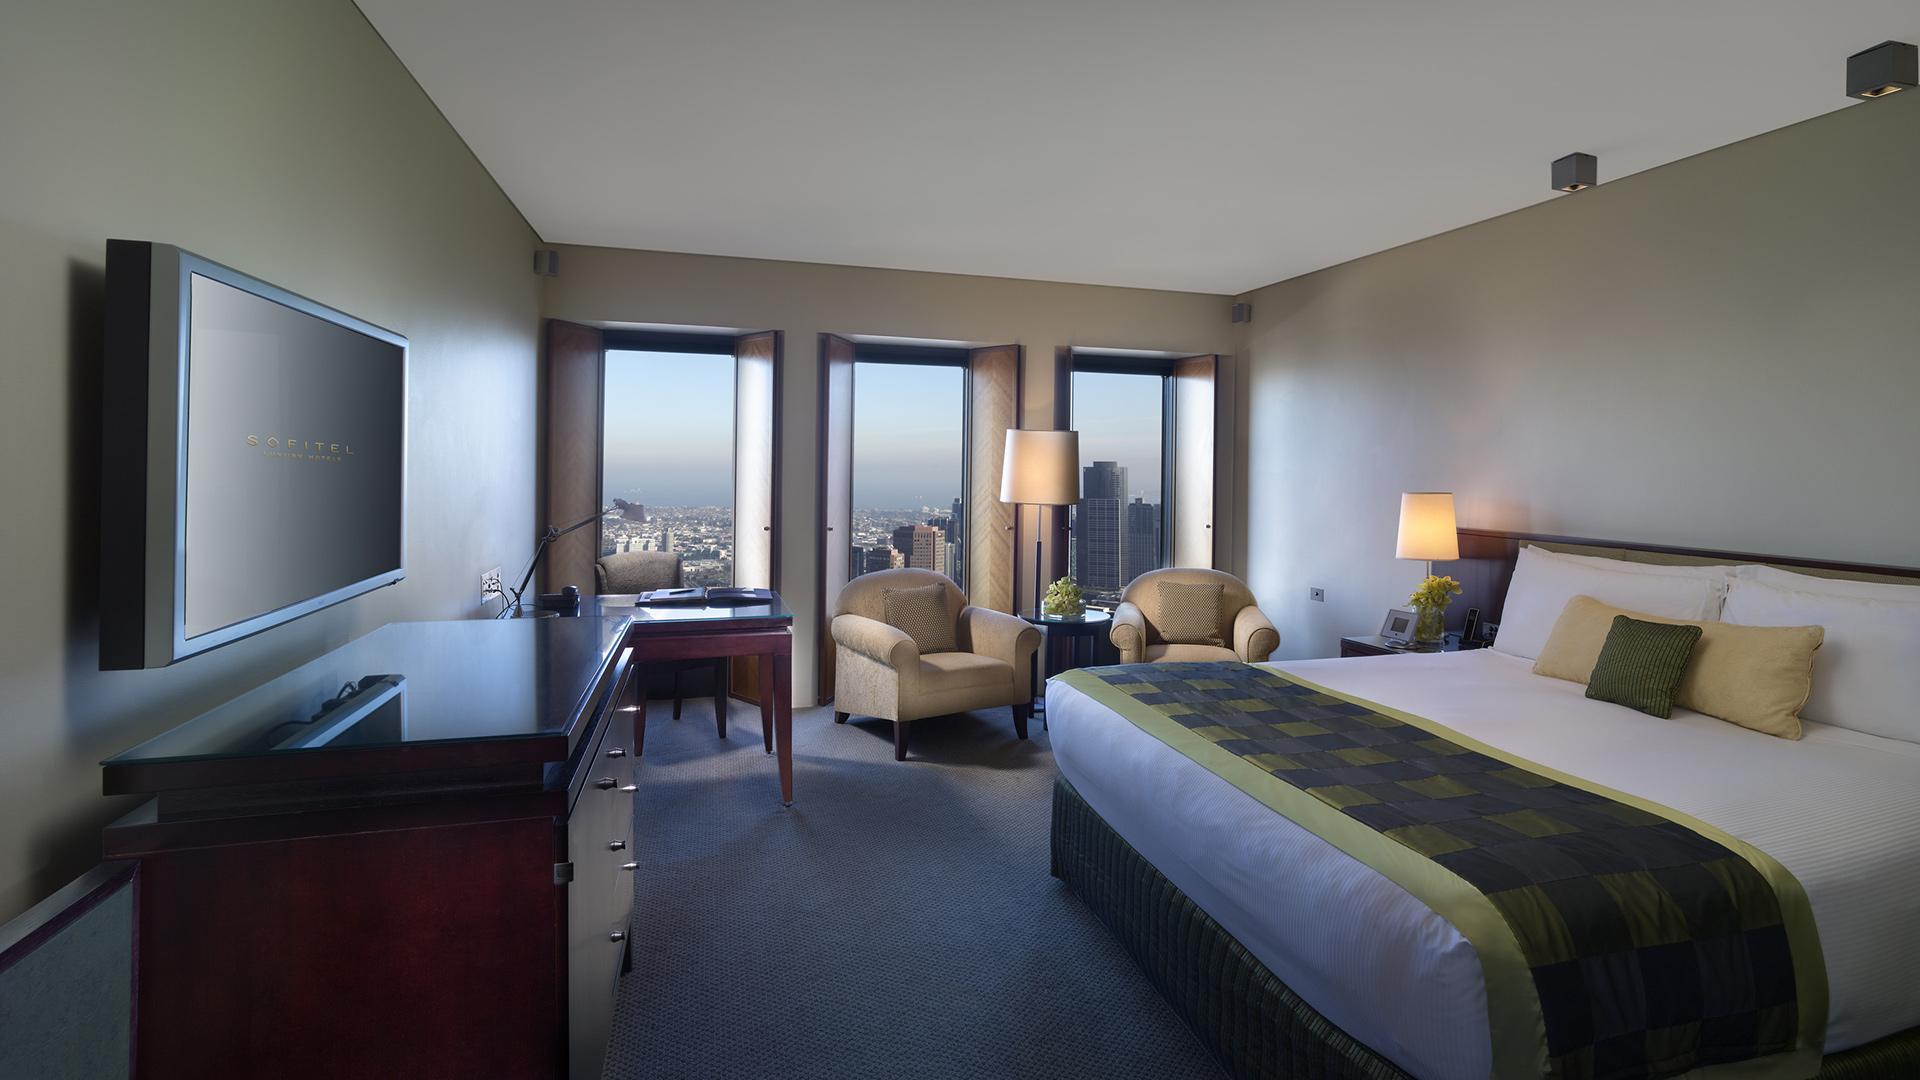 Superior Room image 1 at Sofitel Melbourne on Collins by Melbourne City, Victoria, Australia